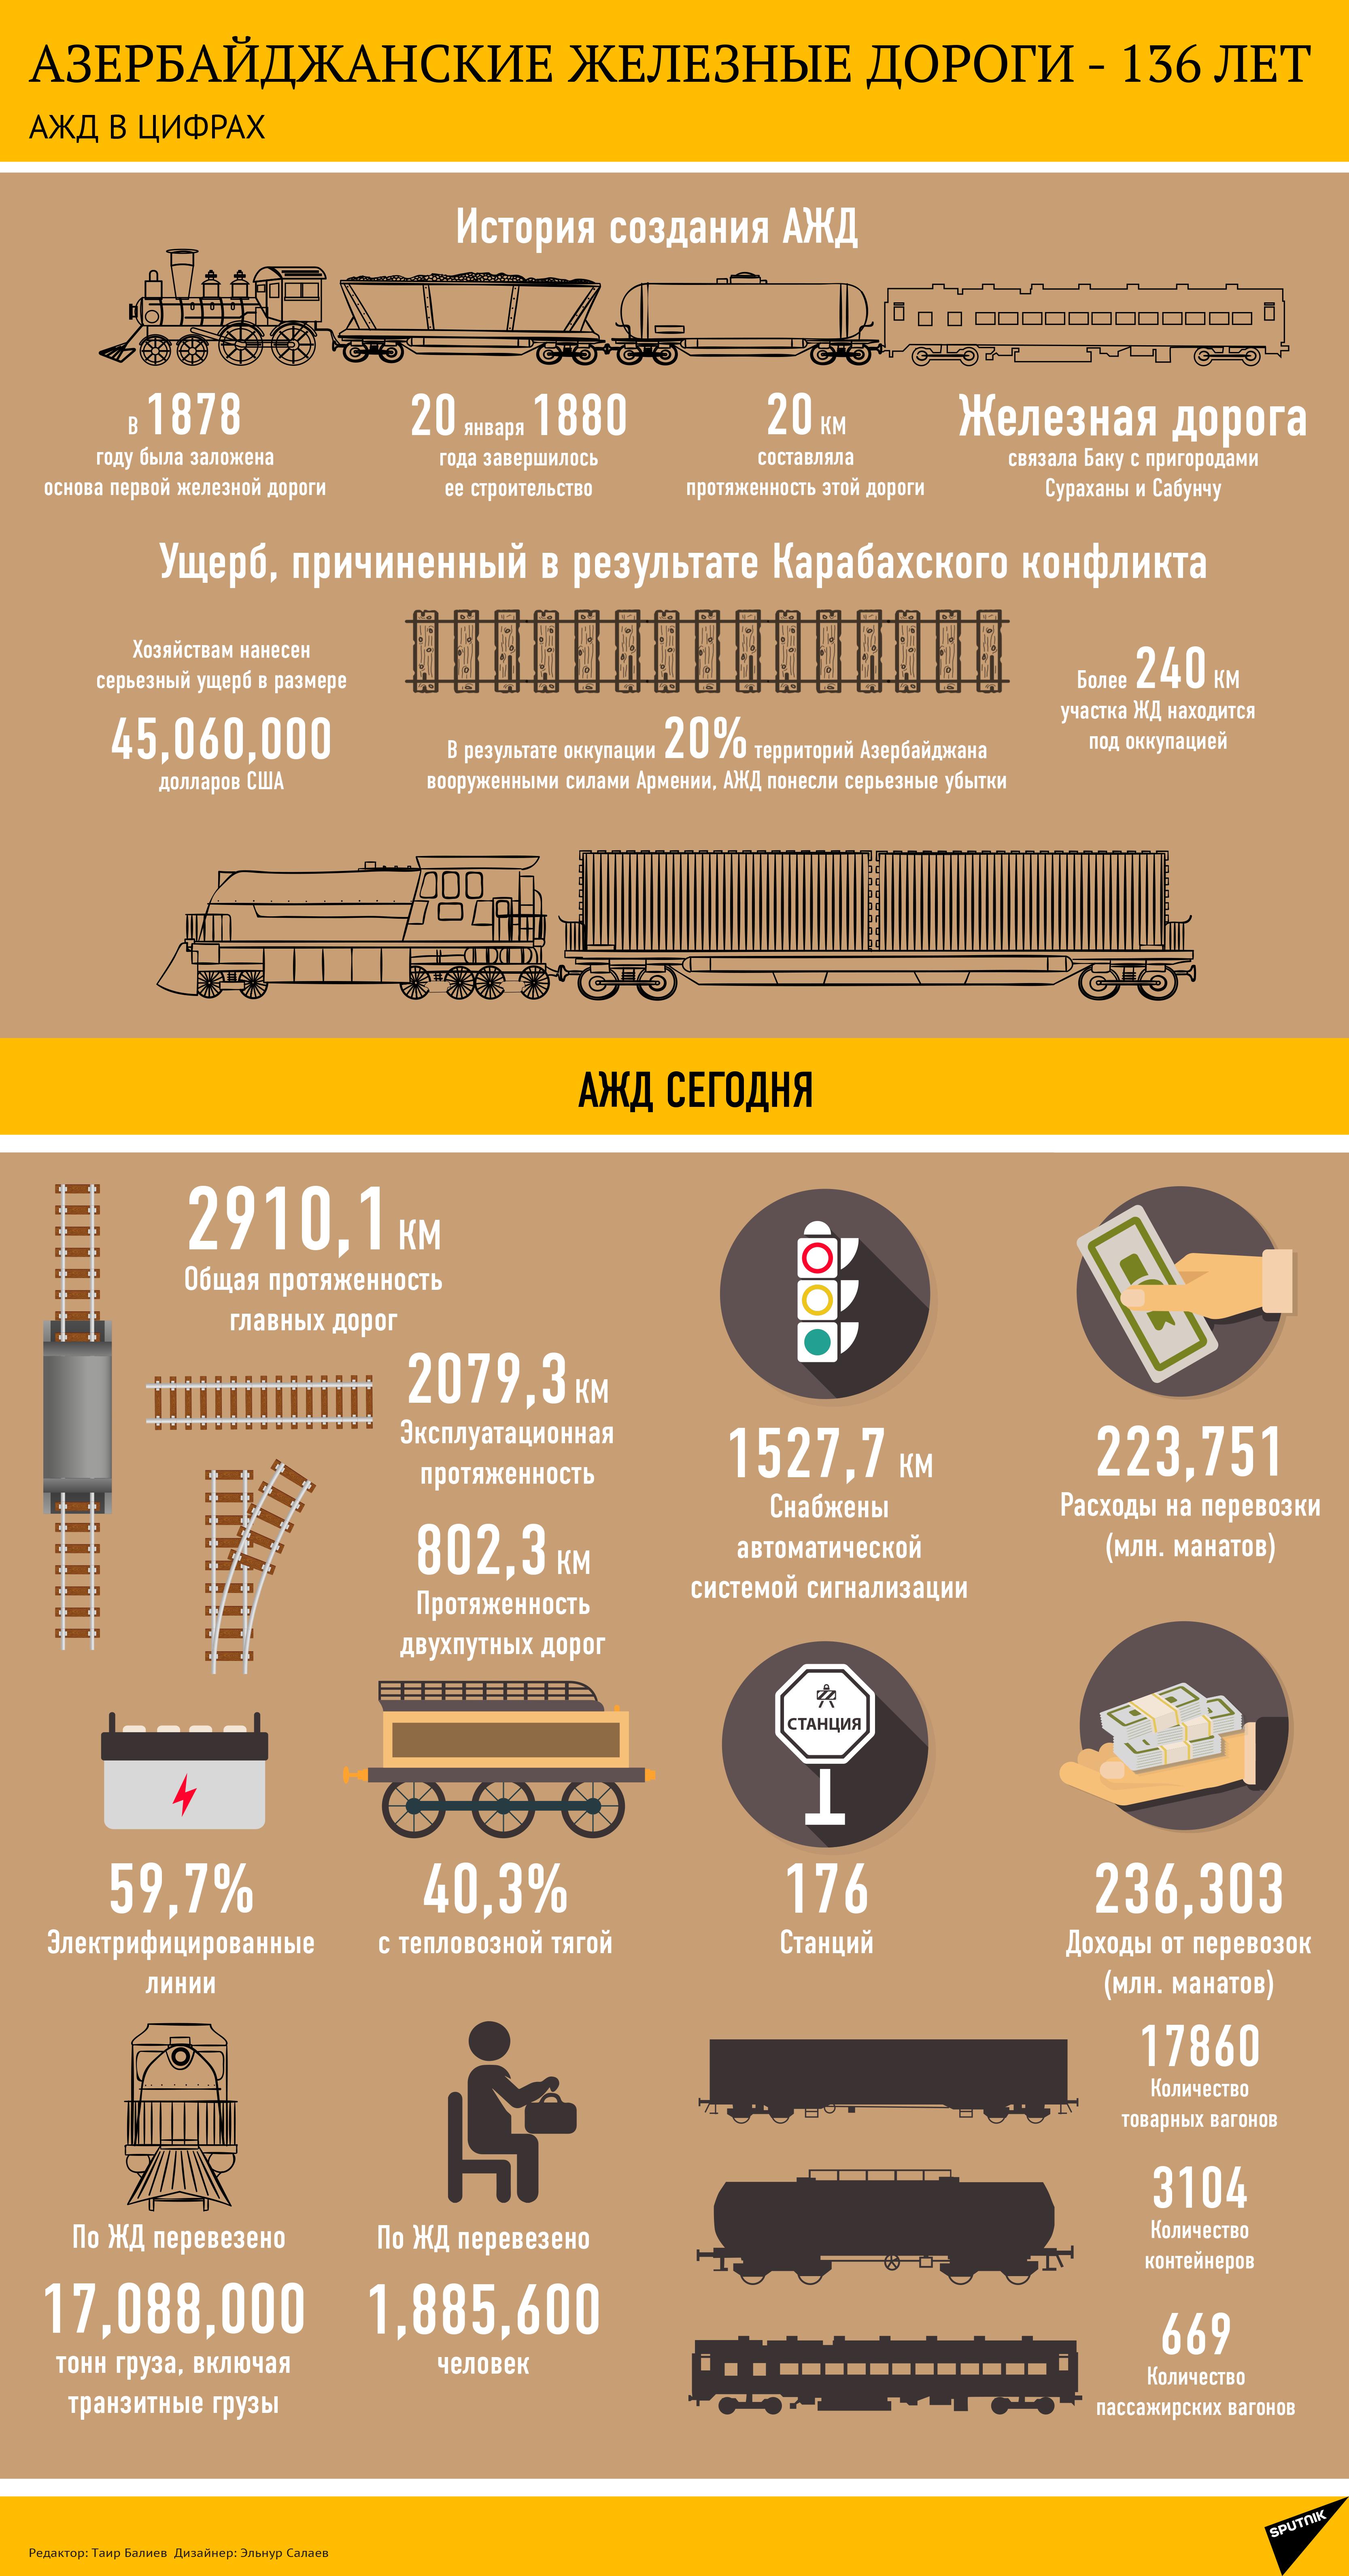 Азербайджанские железные дороги - Sputnik Азербайджан